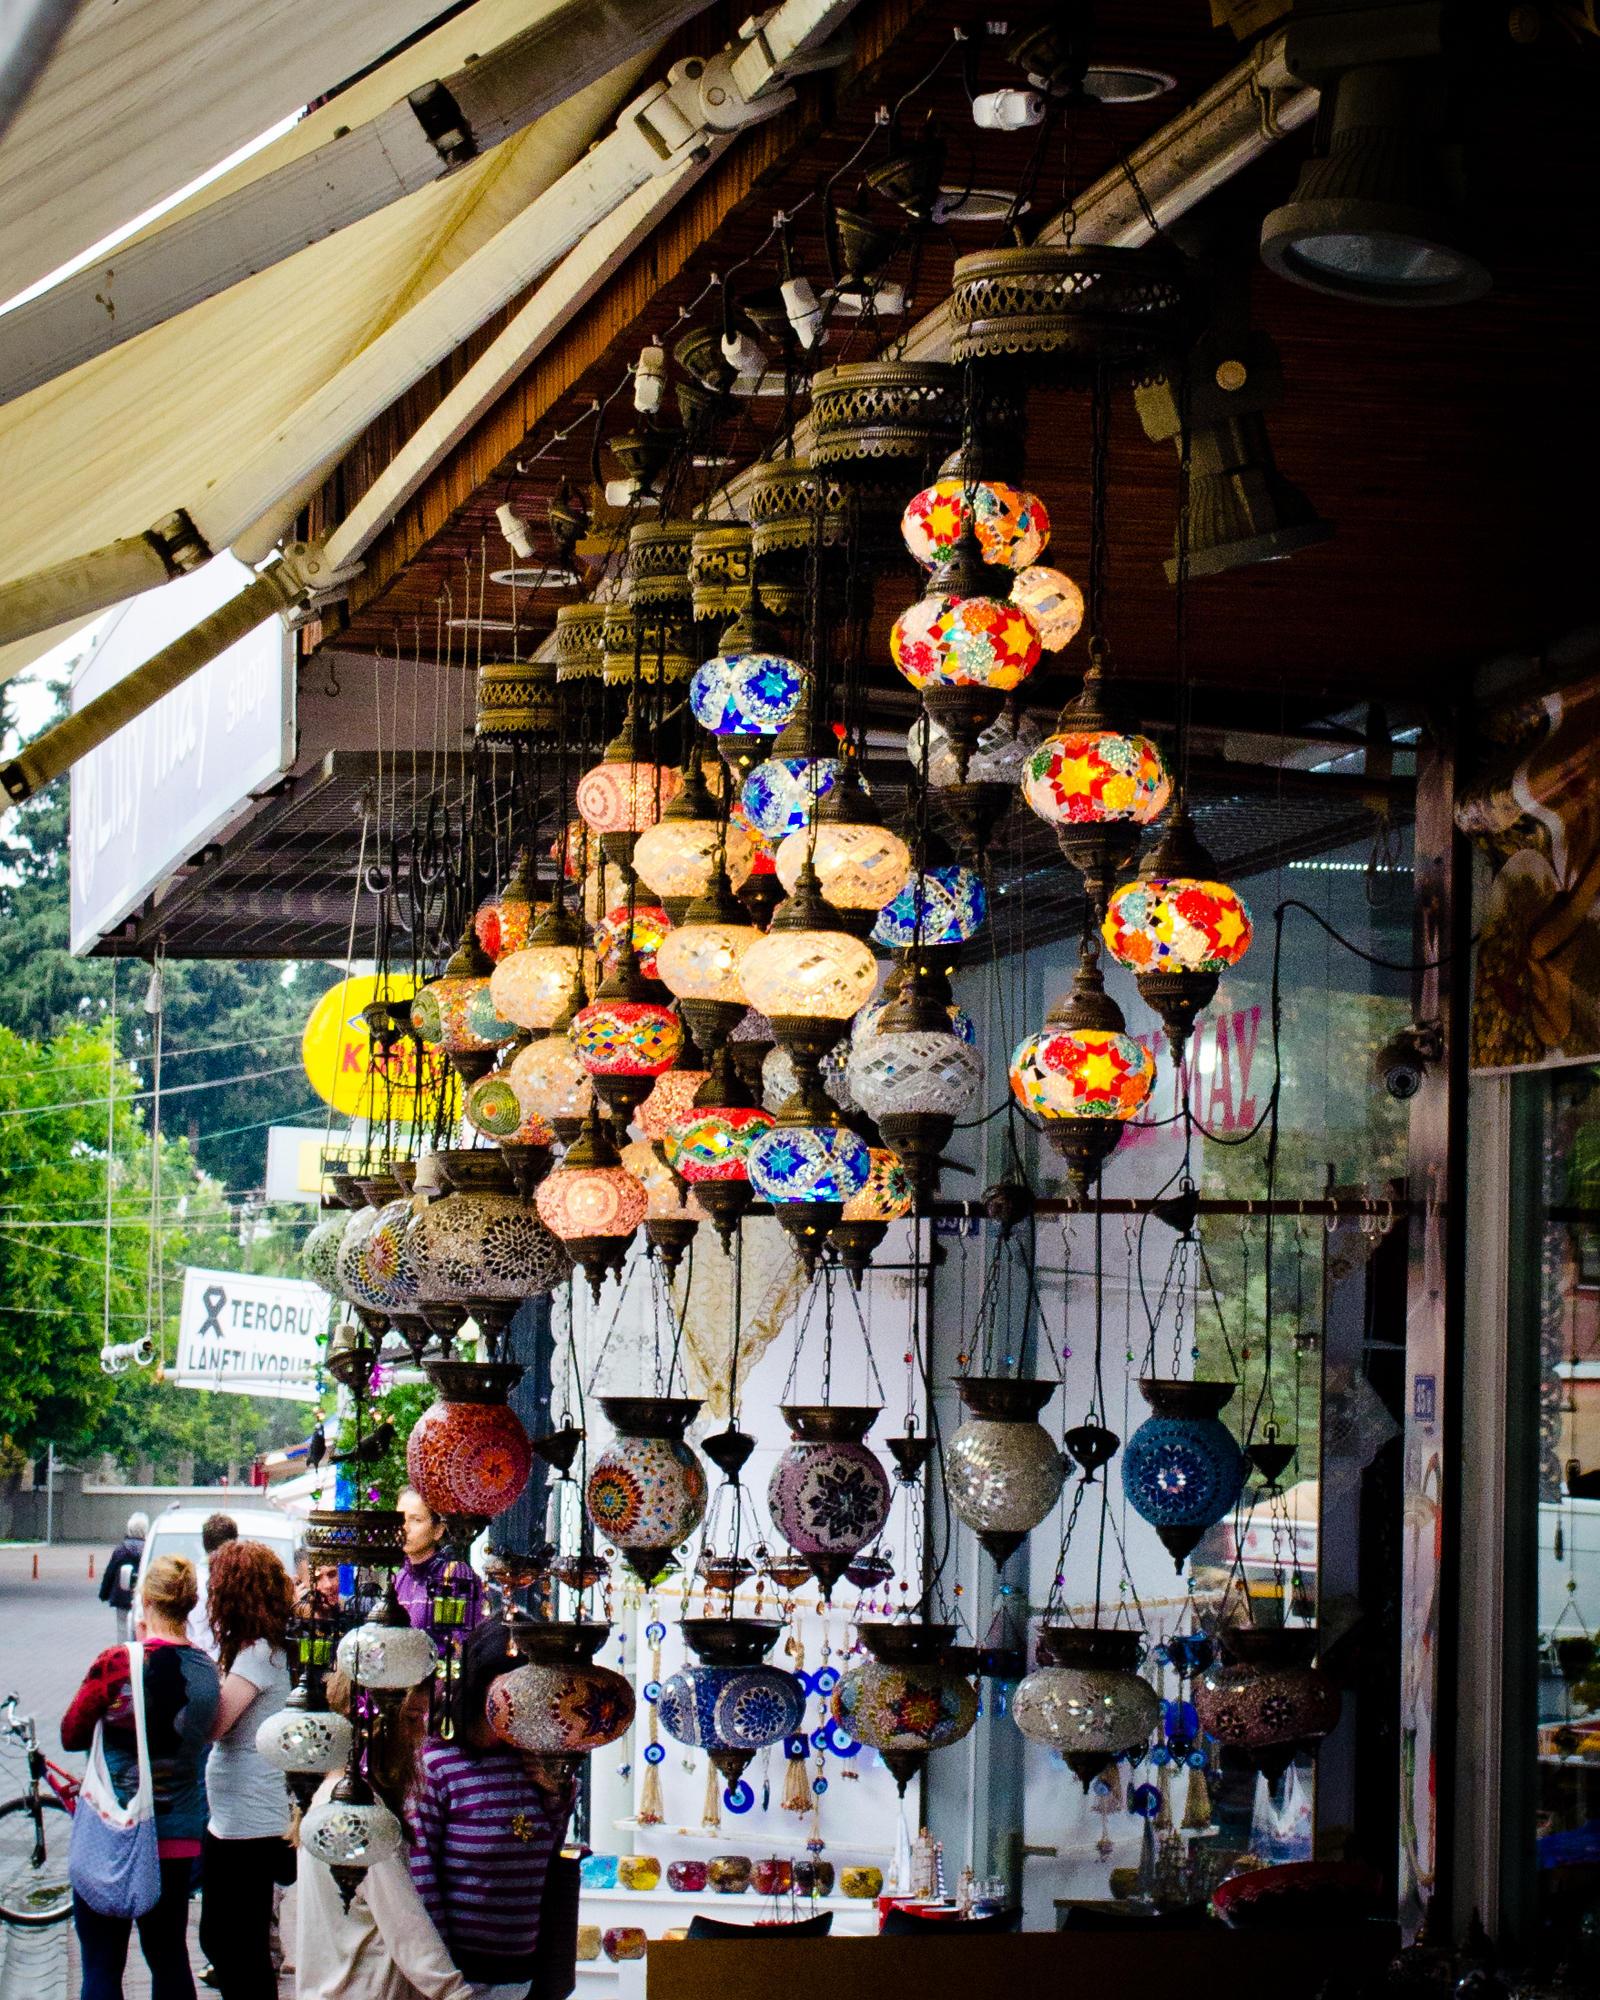 Turkish Lamps by AstarothSquirrel